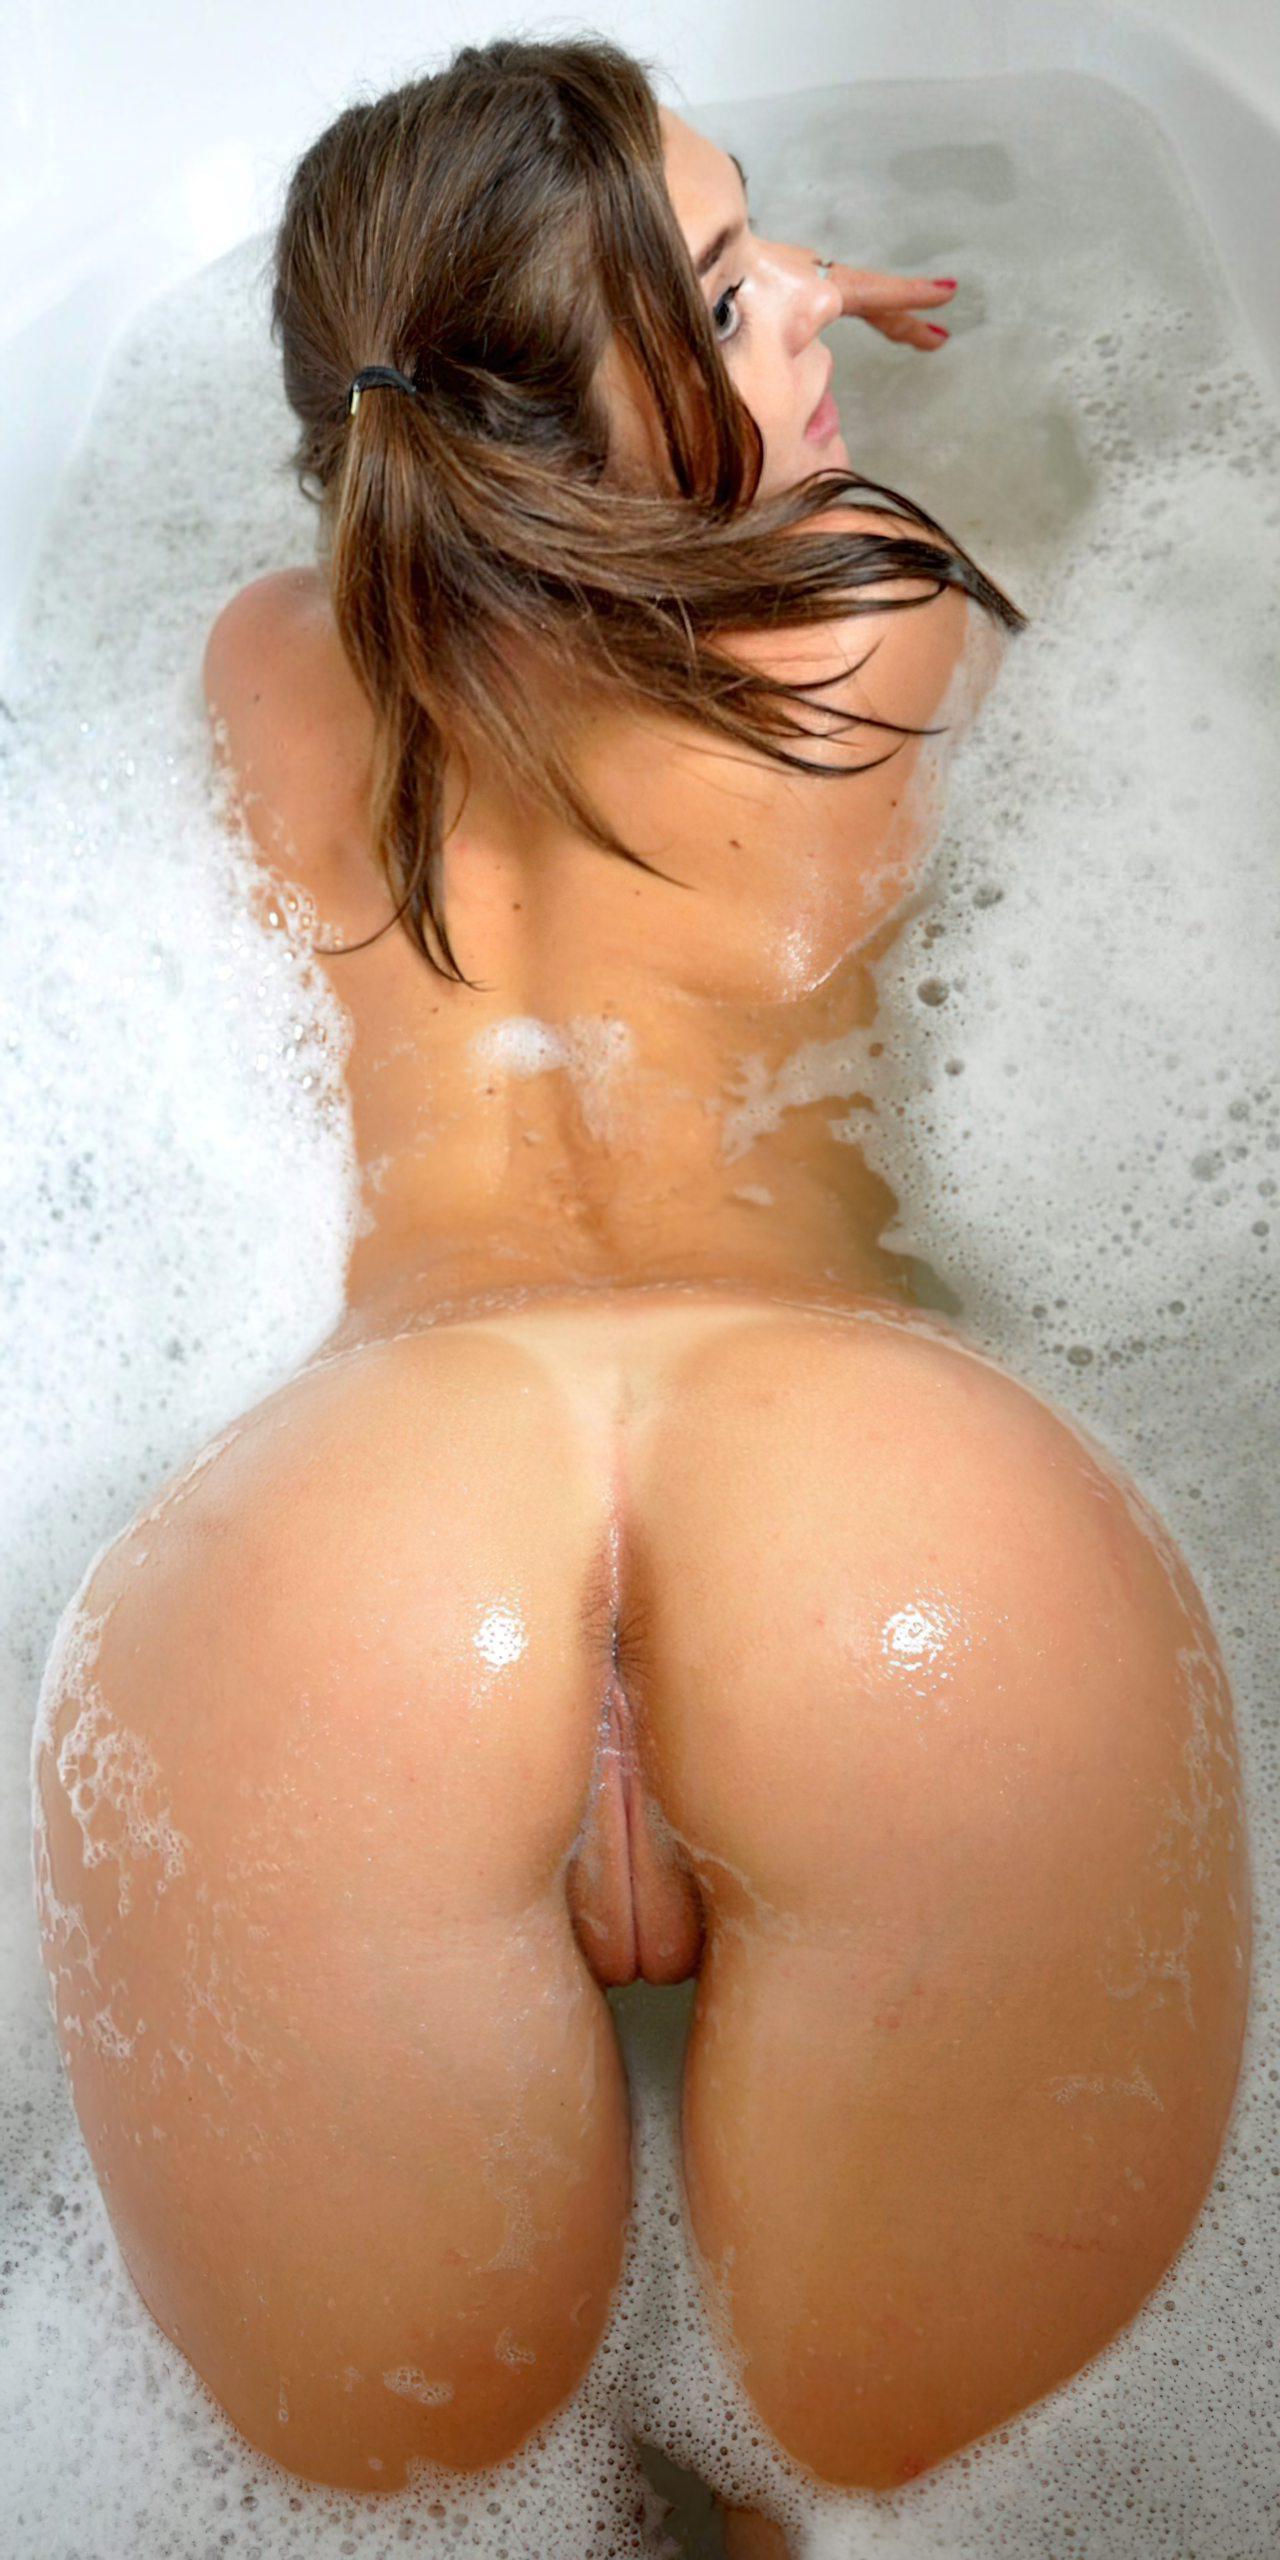 Sexy na Banheira